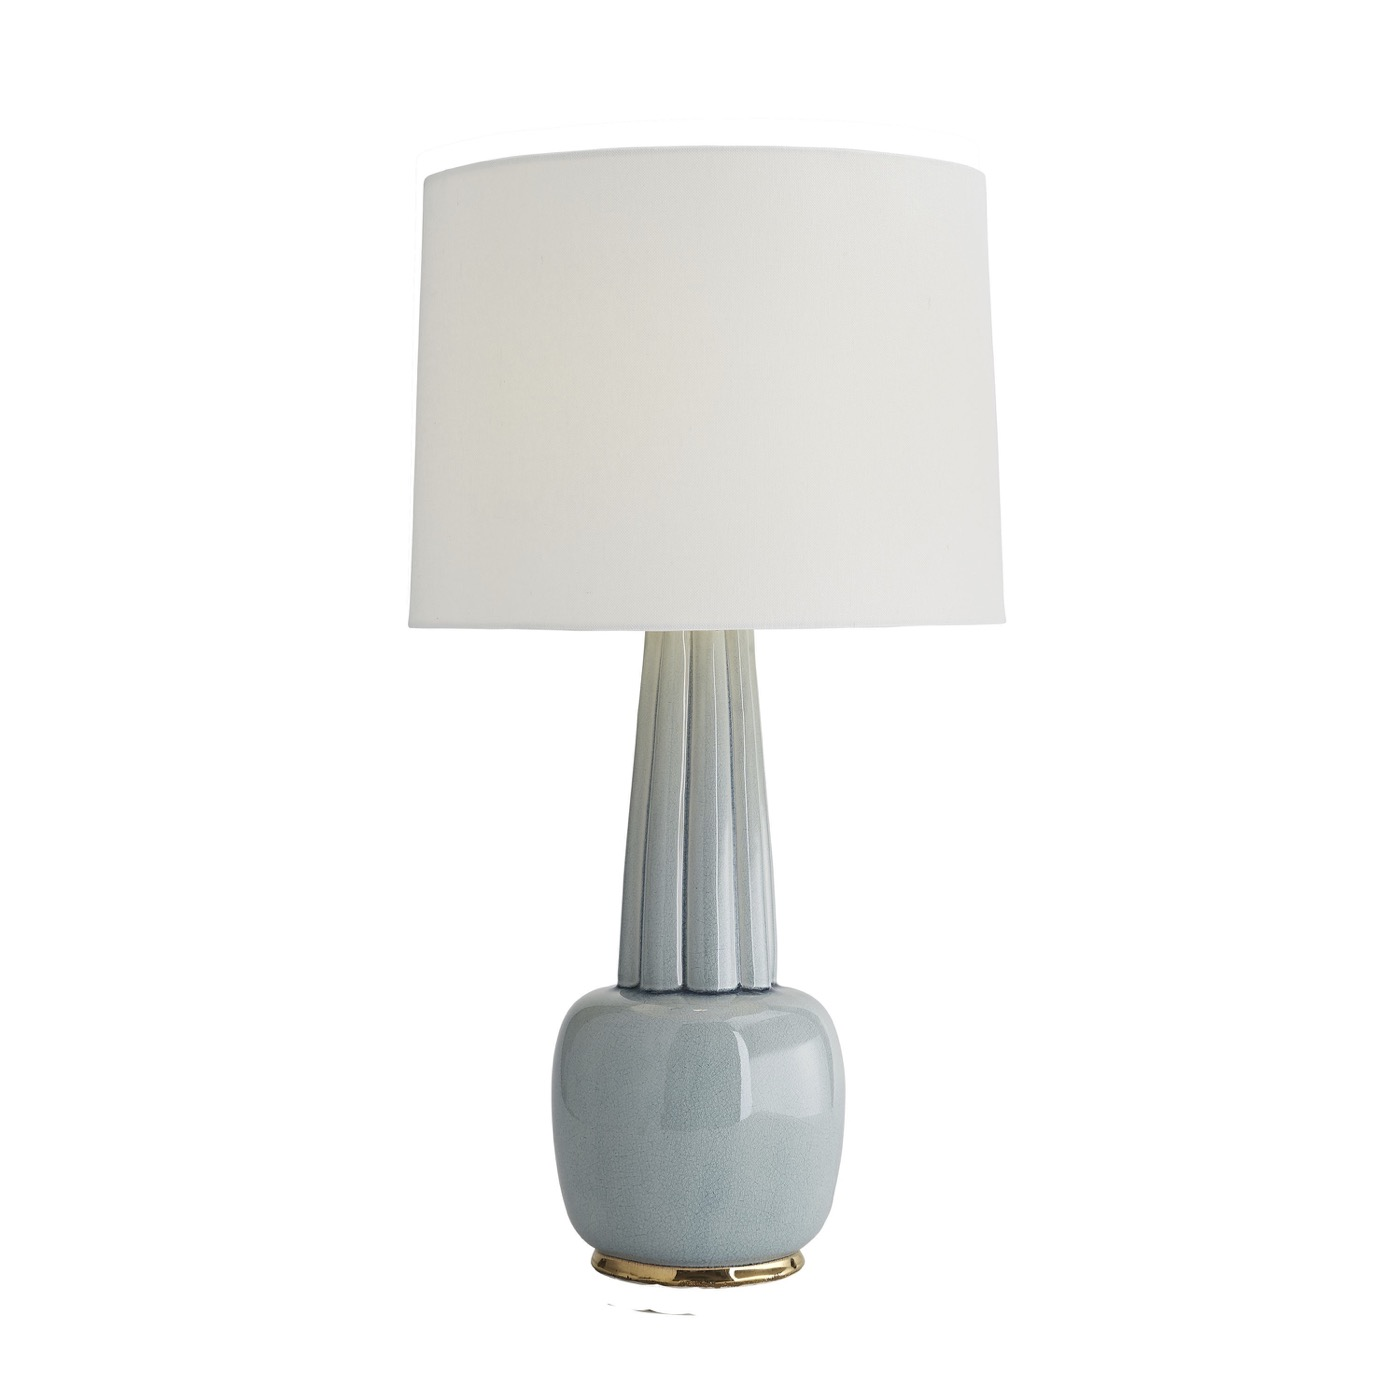 Dolly Ceramic Table Lamp